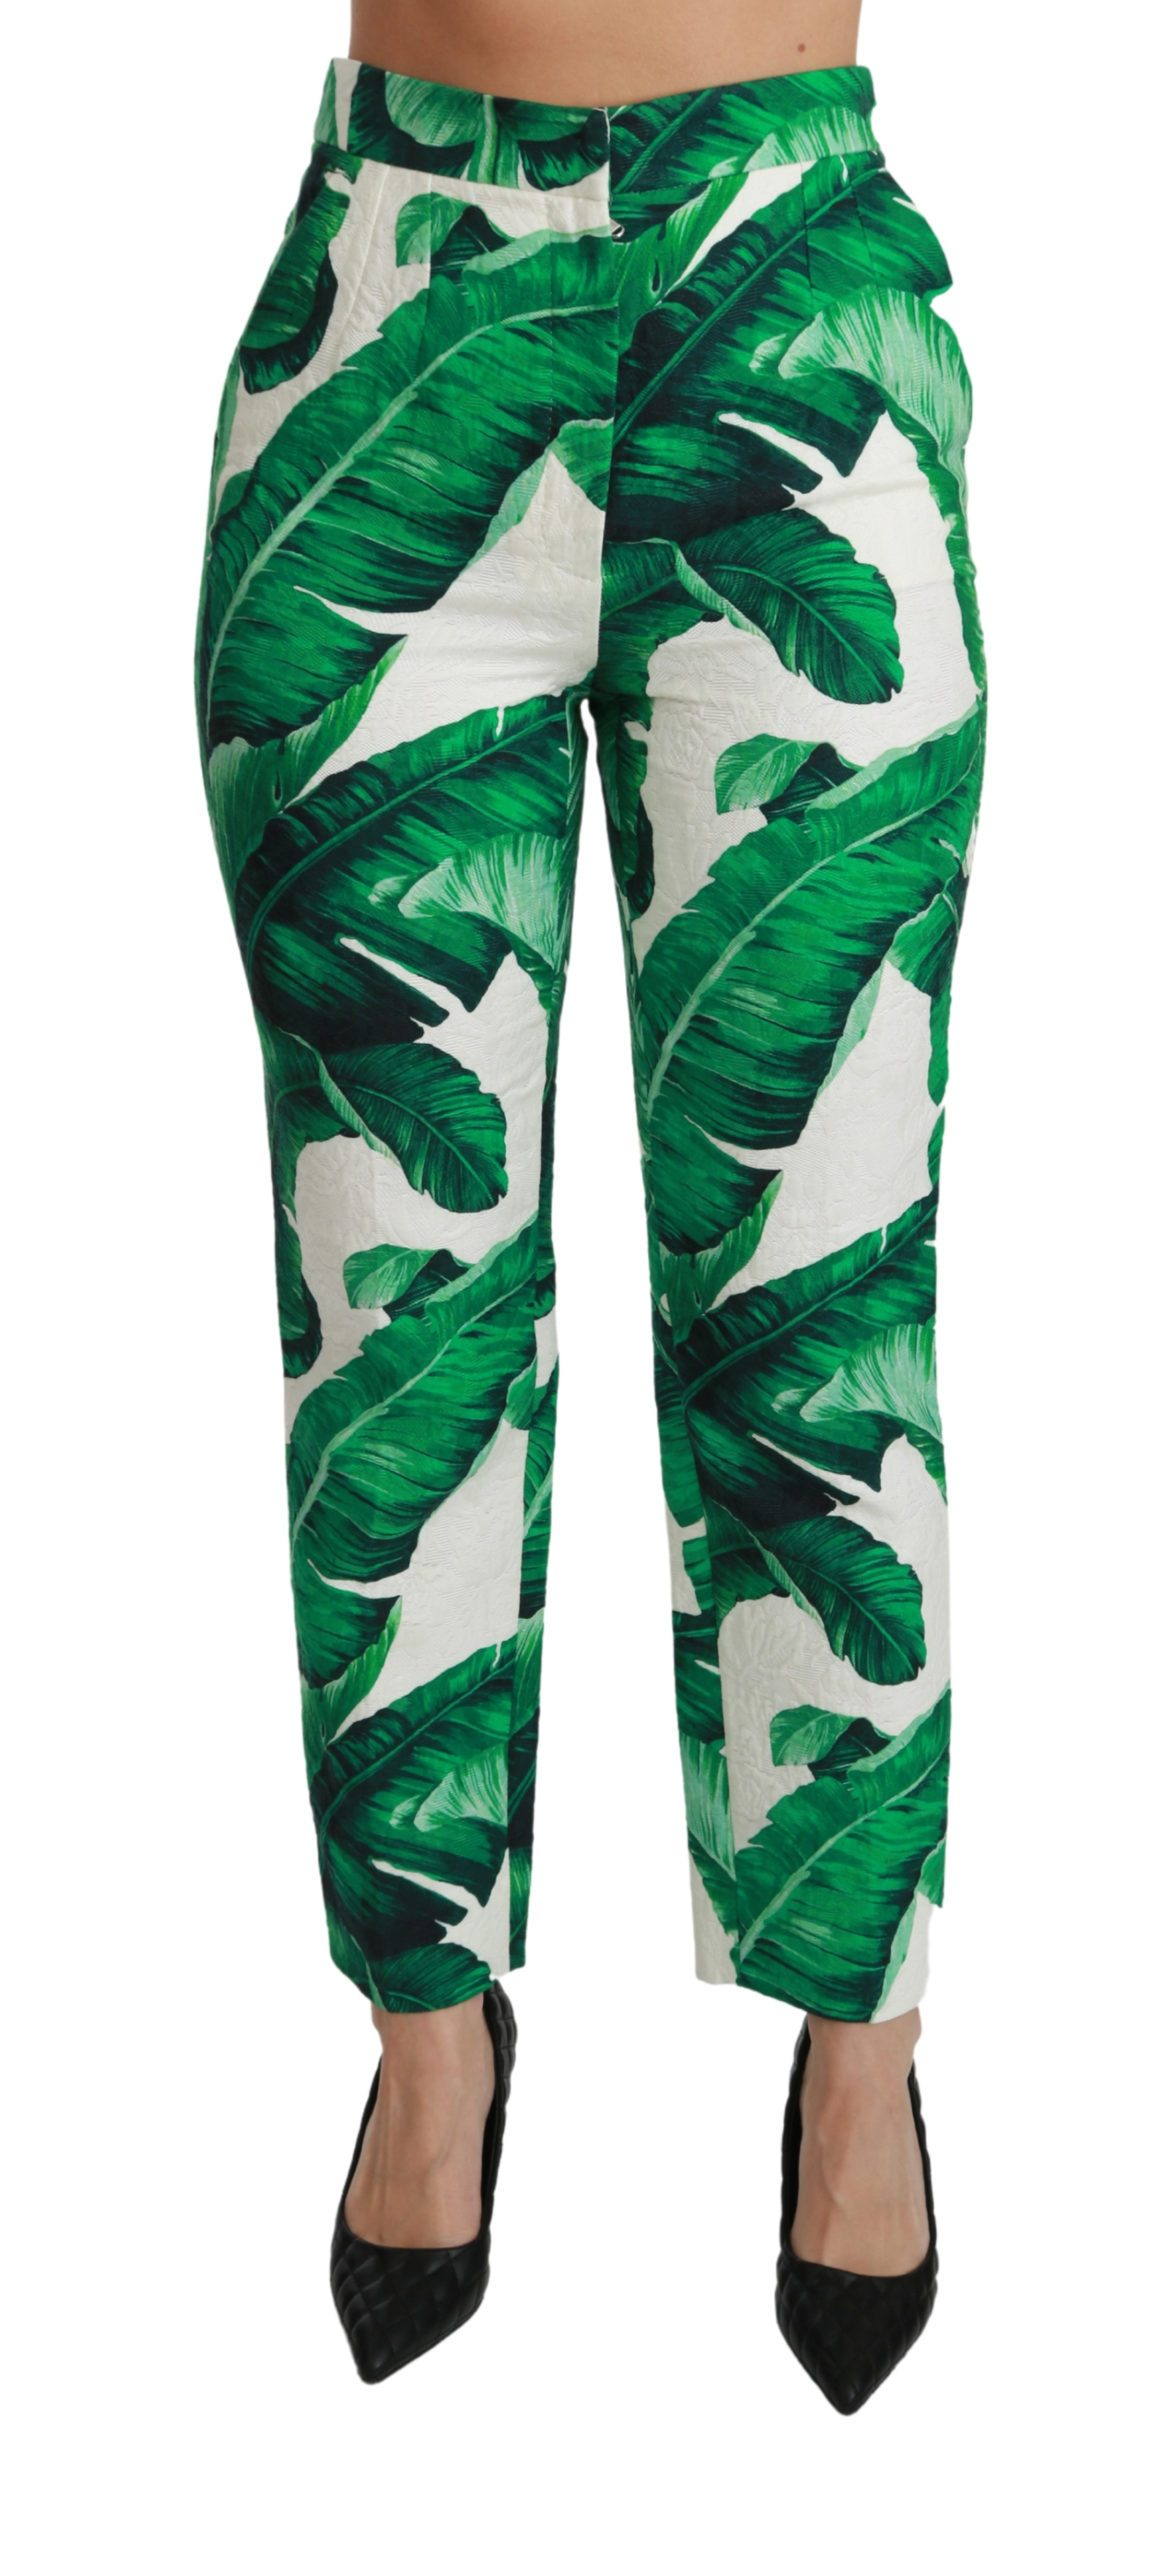 Dolce & Gabbana Women's High Waist Slim Trousers Green PAN70828-42 - IT42 M